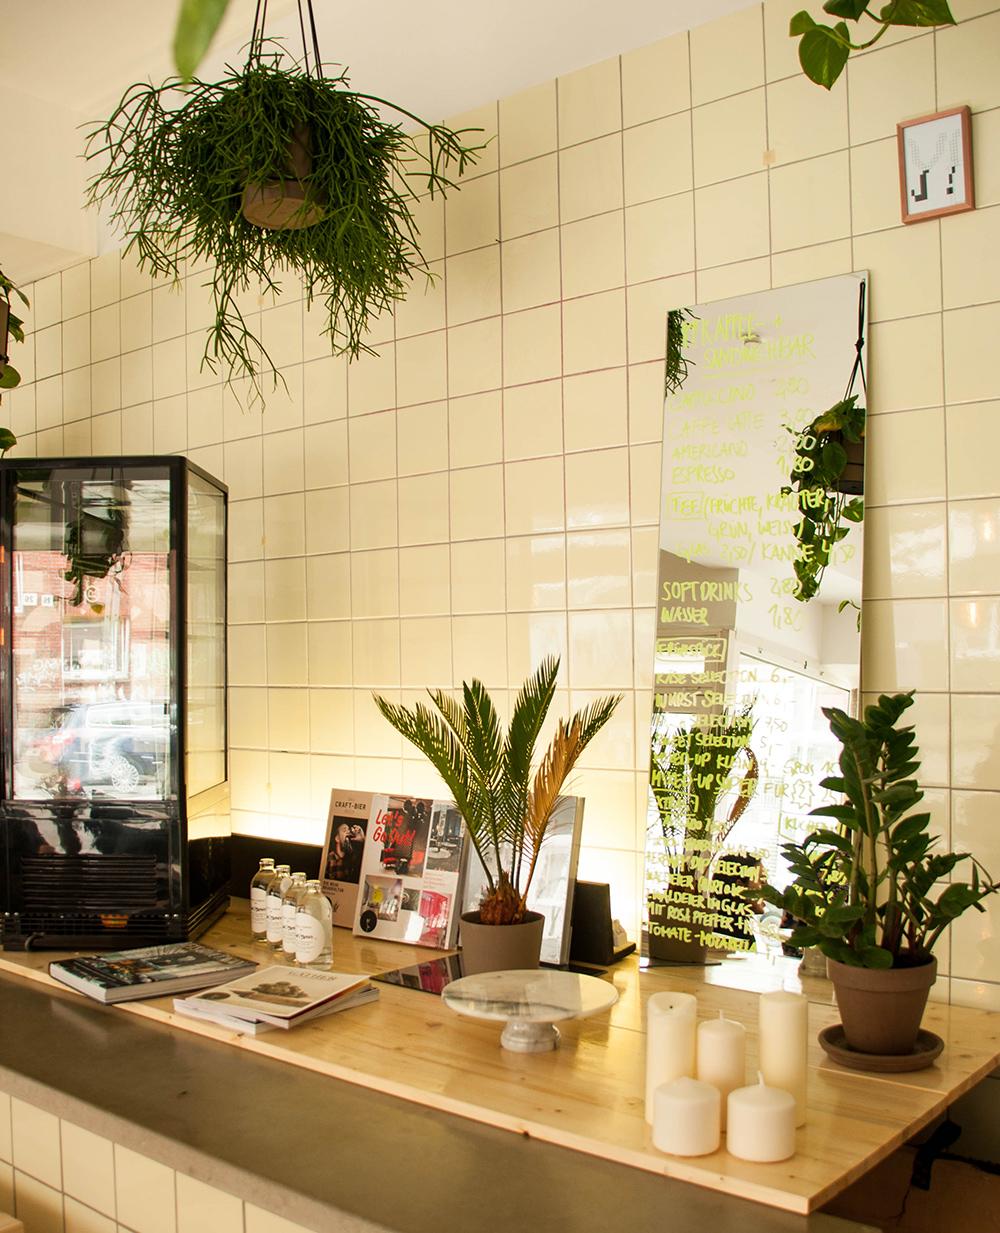 Herbary-Cafe-Y-Lea-Lou-11